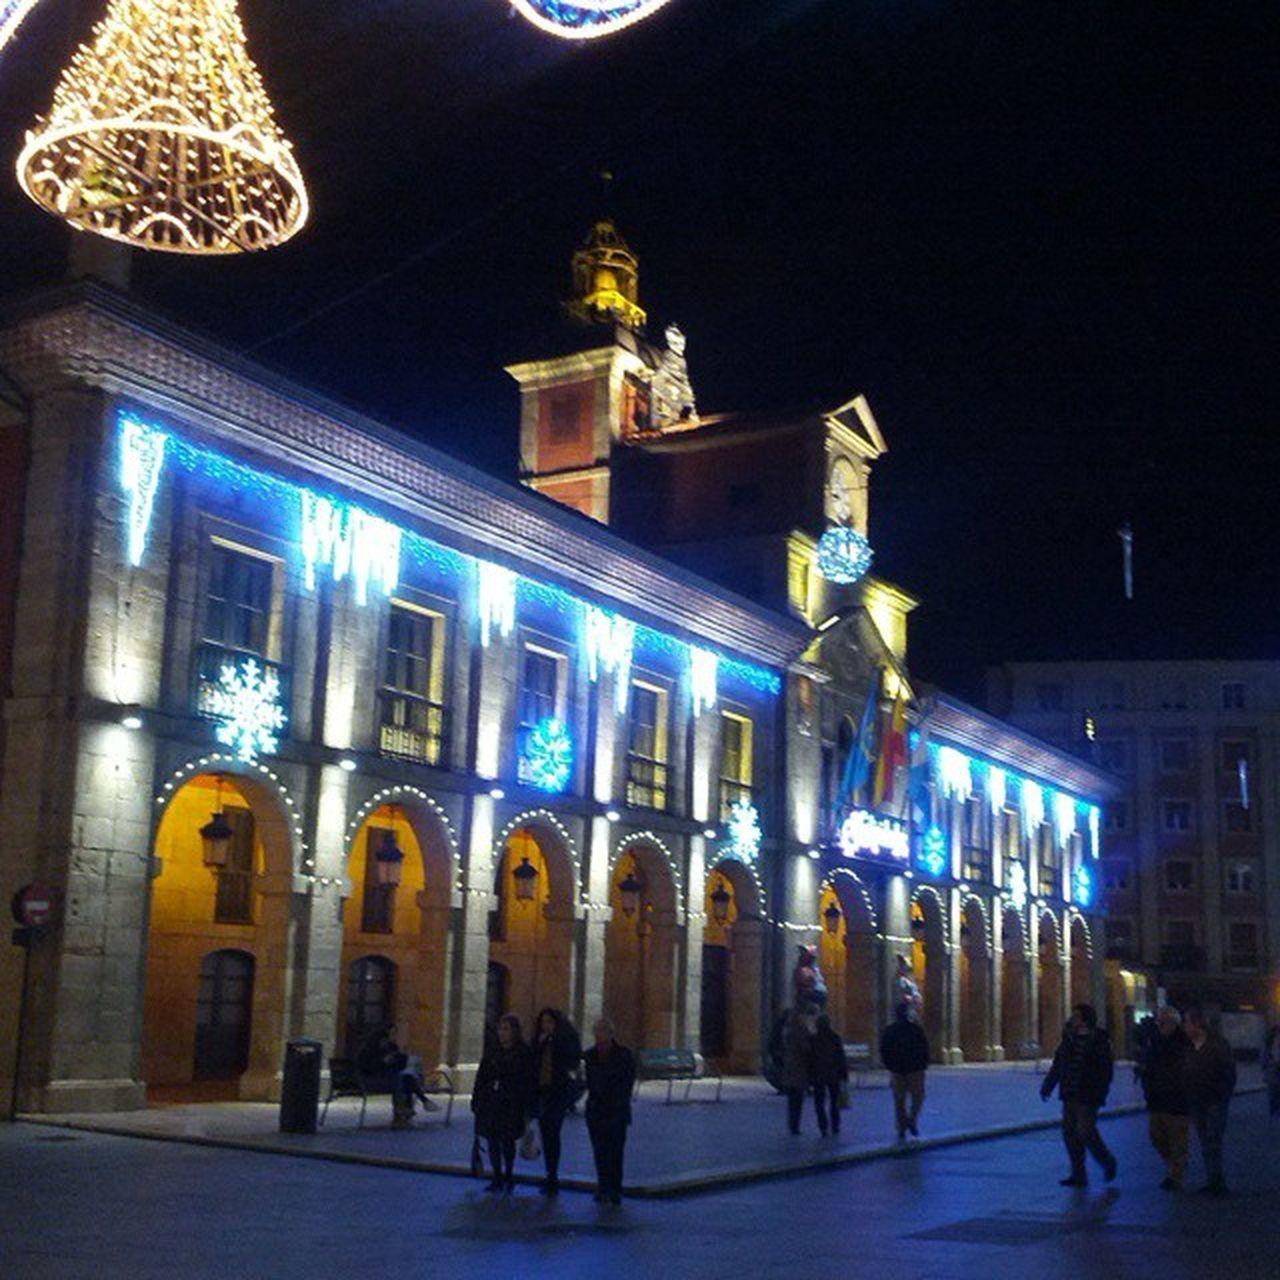 Happy Christmas Frohe Weihnachten Avilés Asturias FelizNochebuena